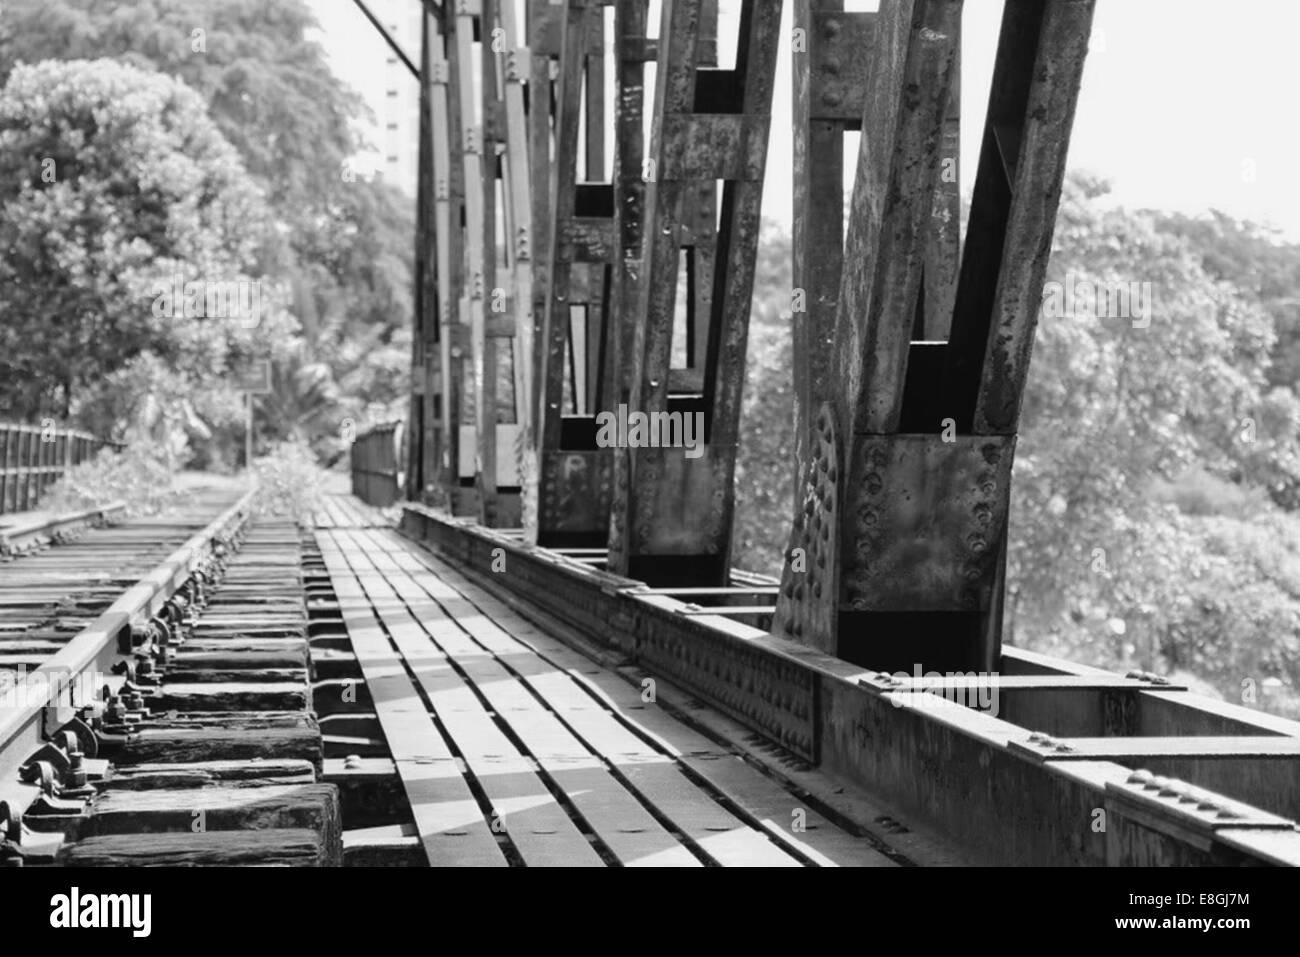 Vía férrea abandonada Imagen De Stock